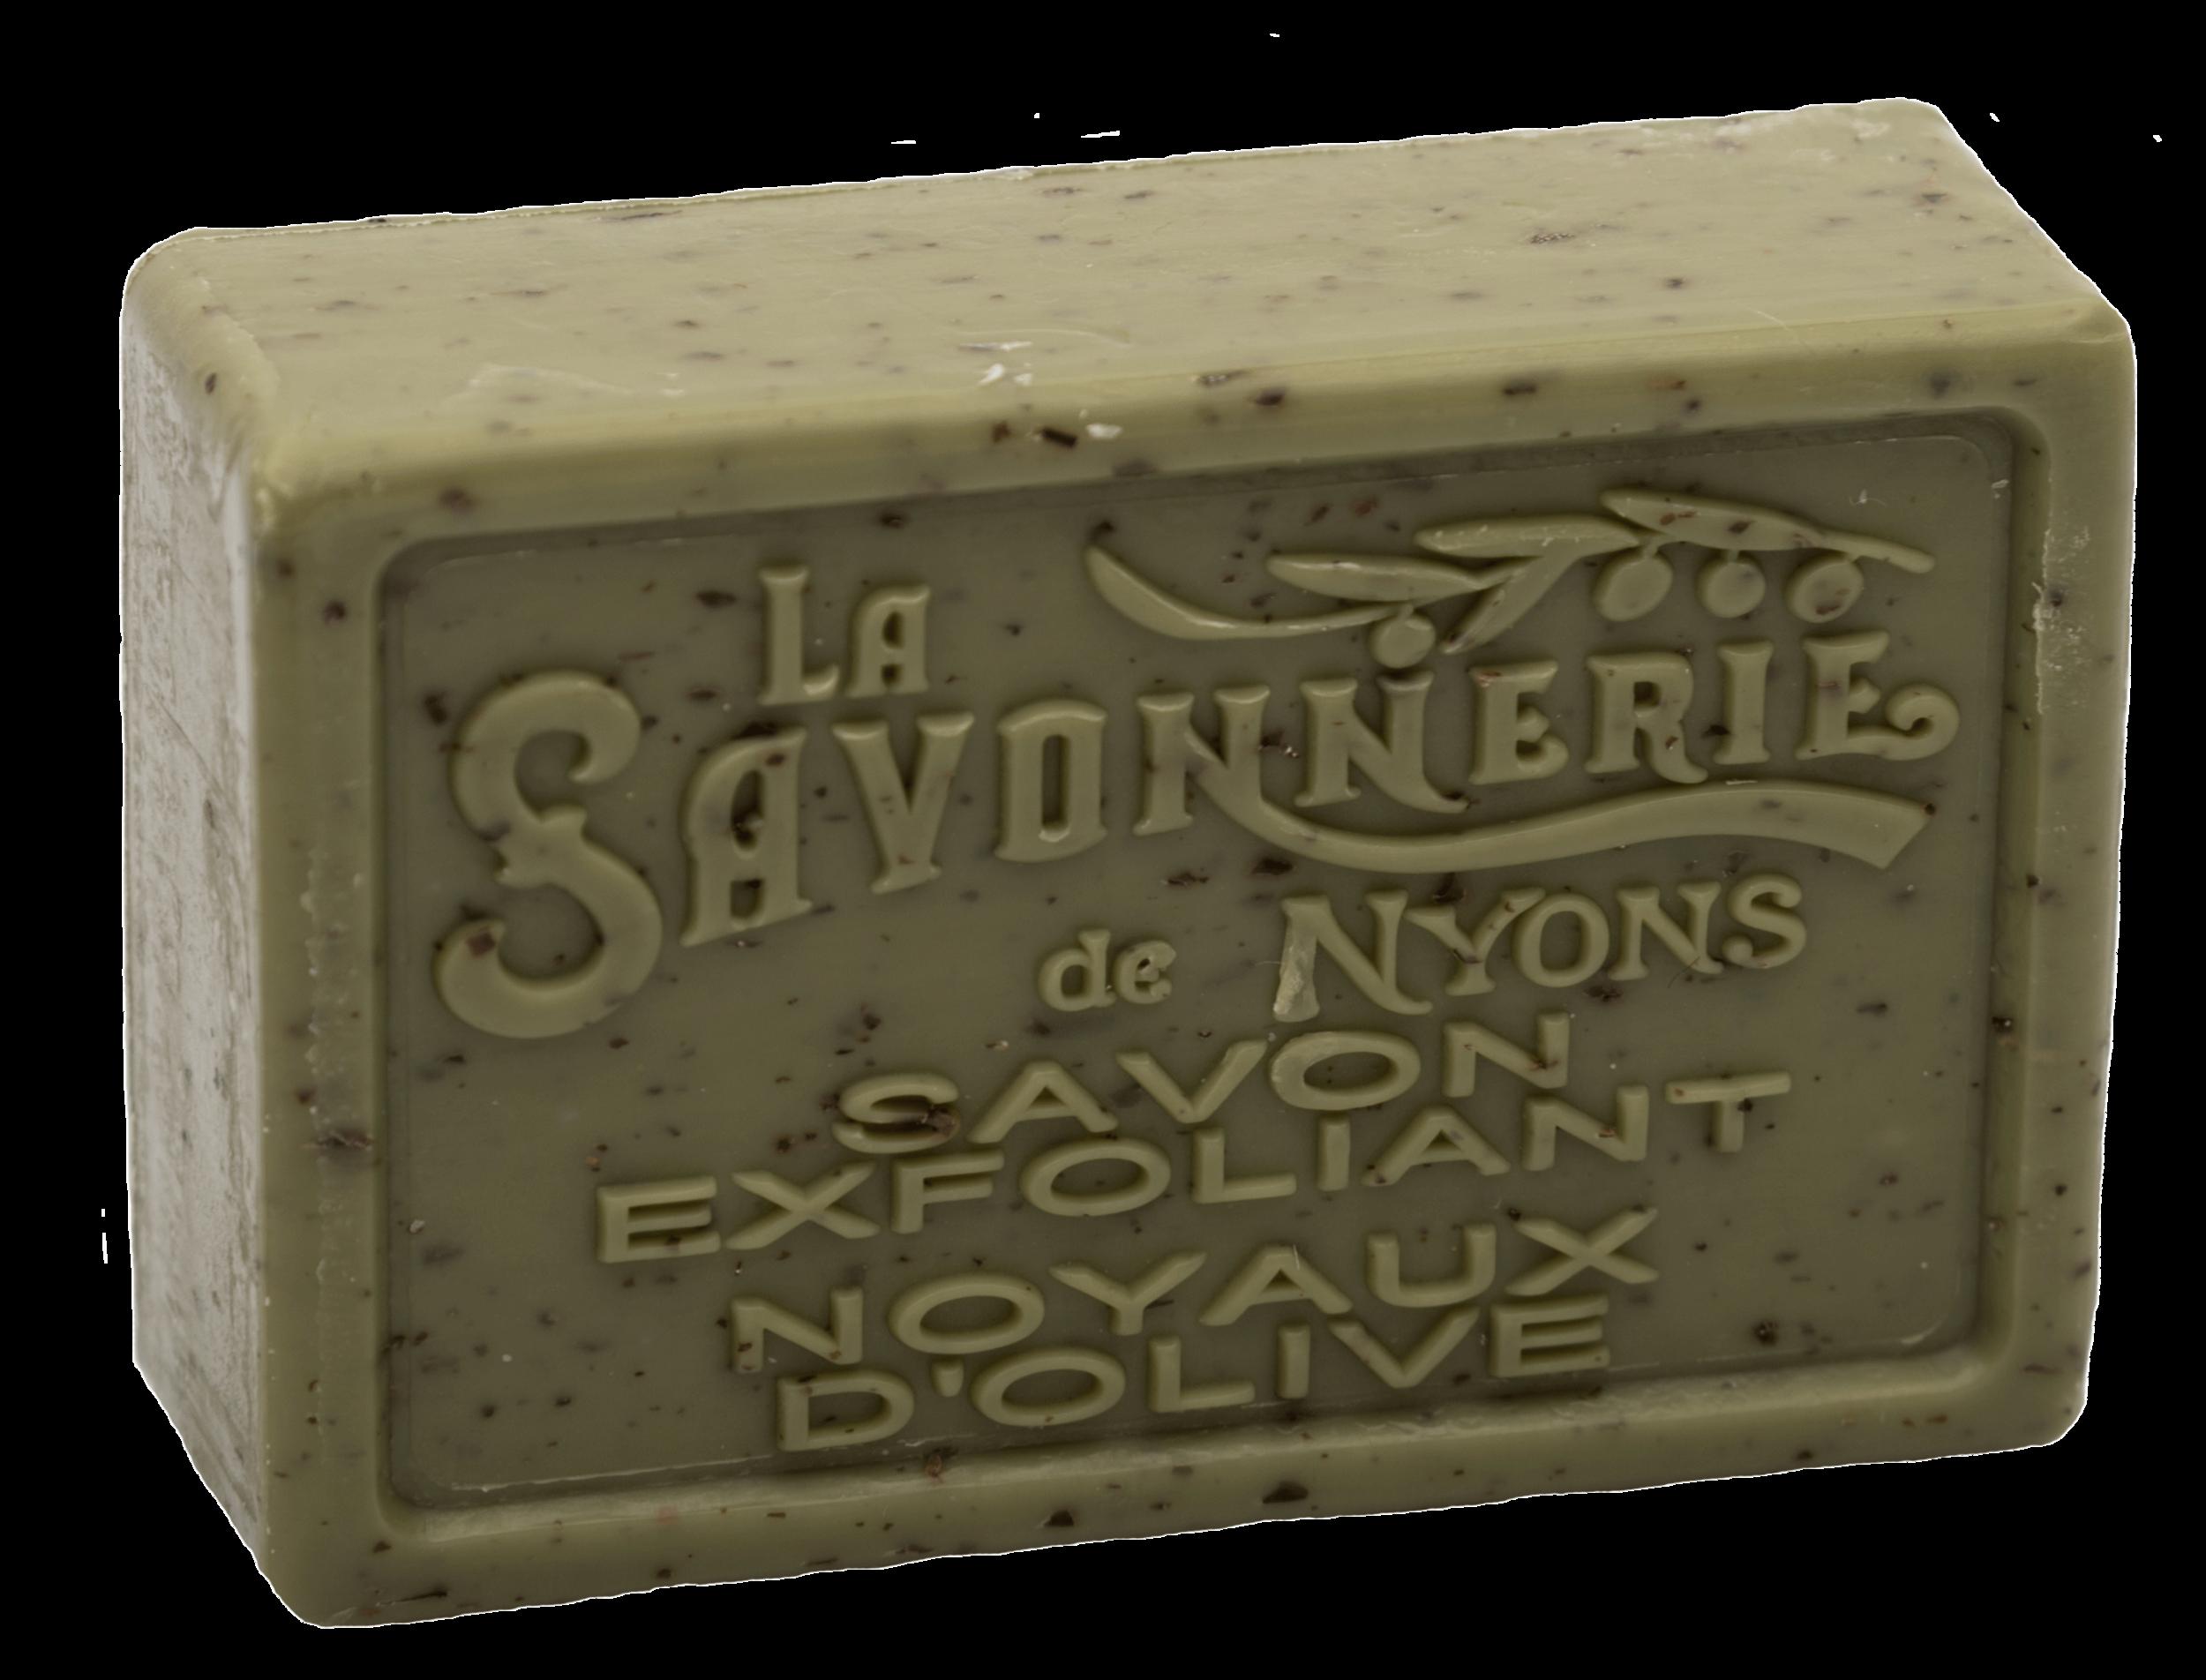 Exfoliant Noyaux d\'Olive